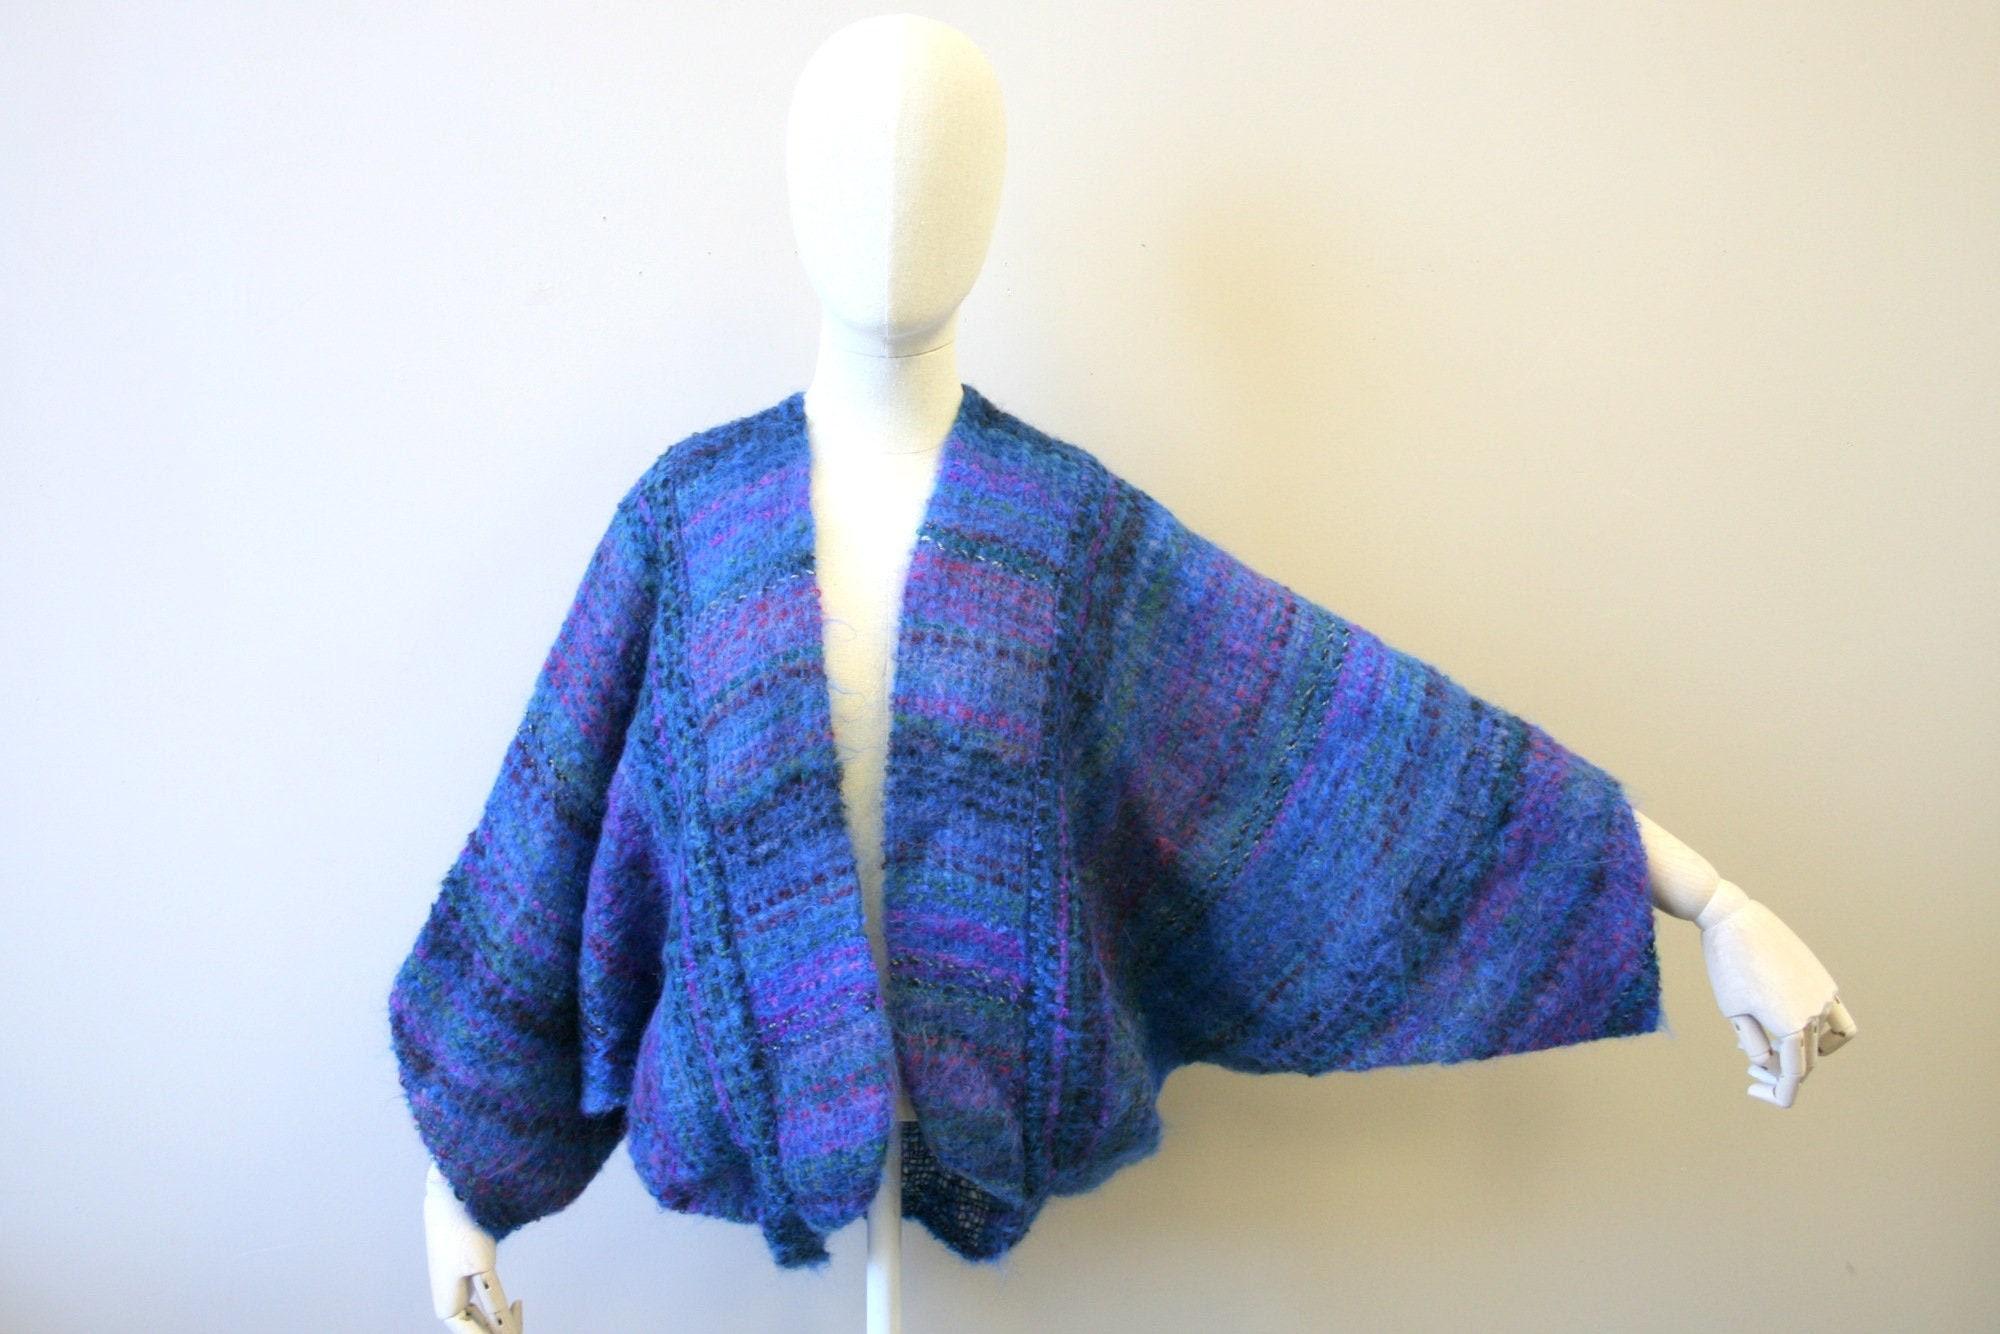 80s Sweatshirts, Sweaters, Vests | Women 1980S Blue Mohair Handwoven Shrug Sweater $74.00 AT vintagedancer.com